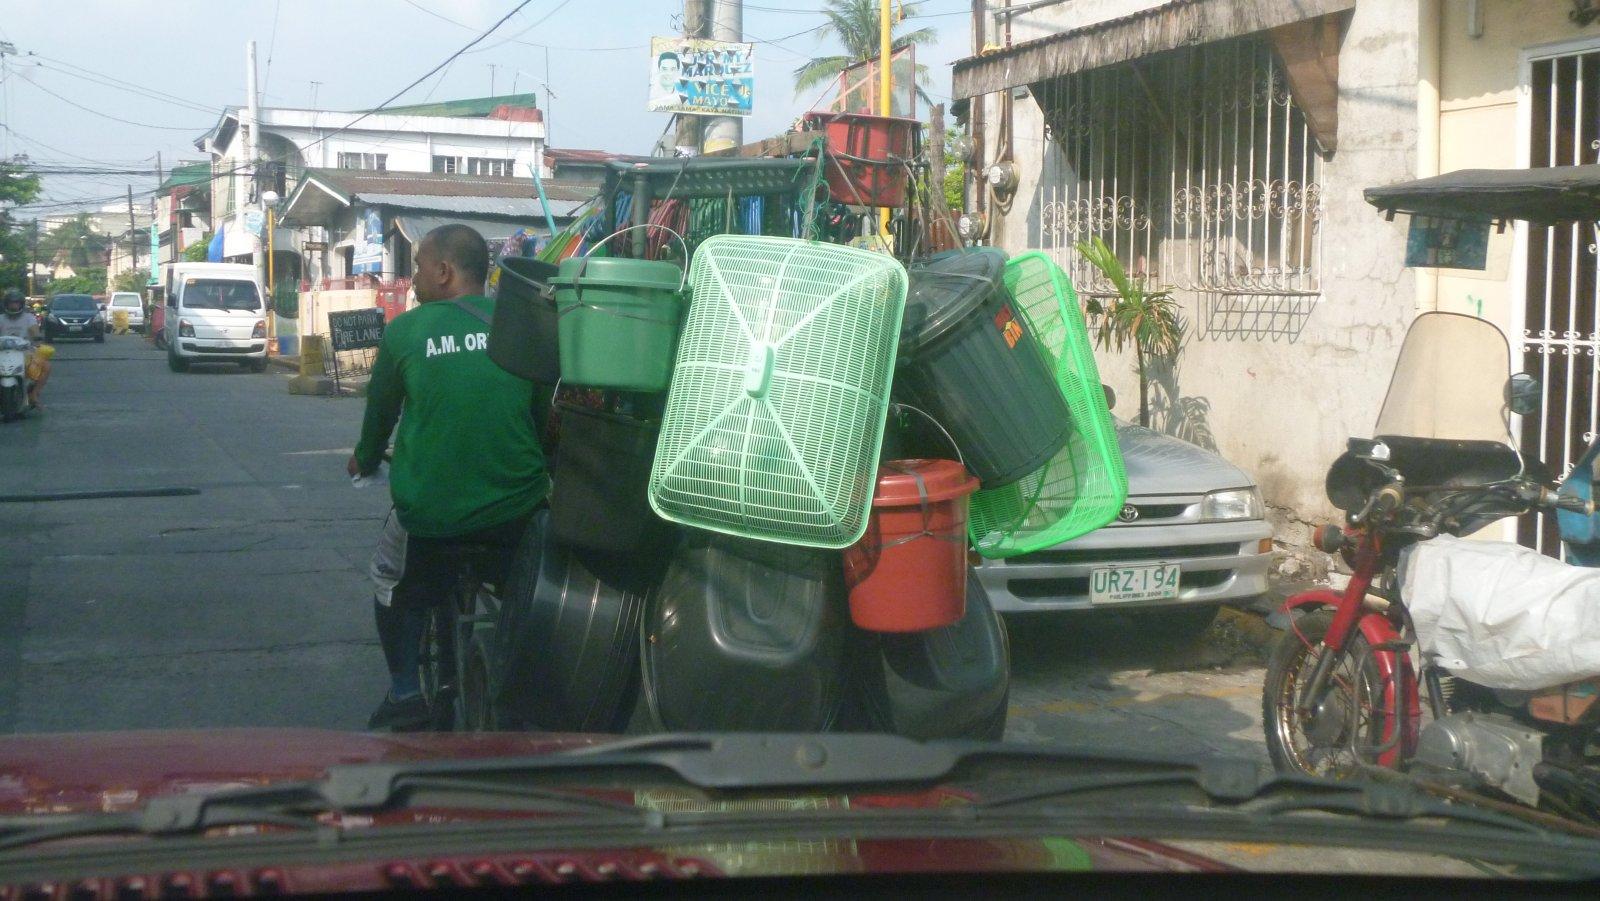 Man-taking-goods-to-sell-on-pedicab